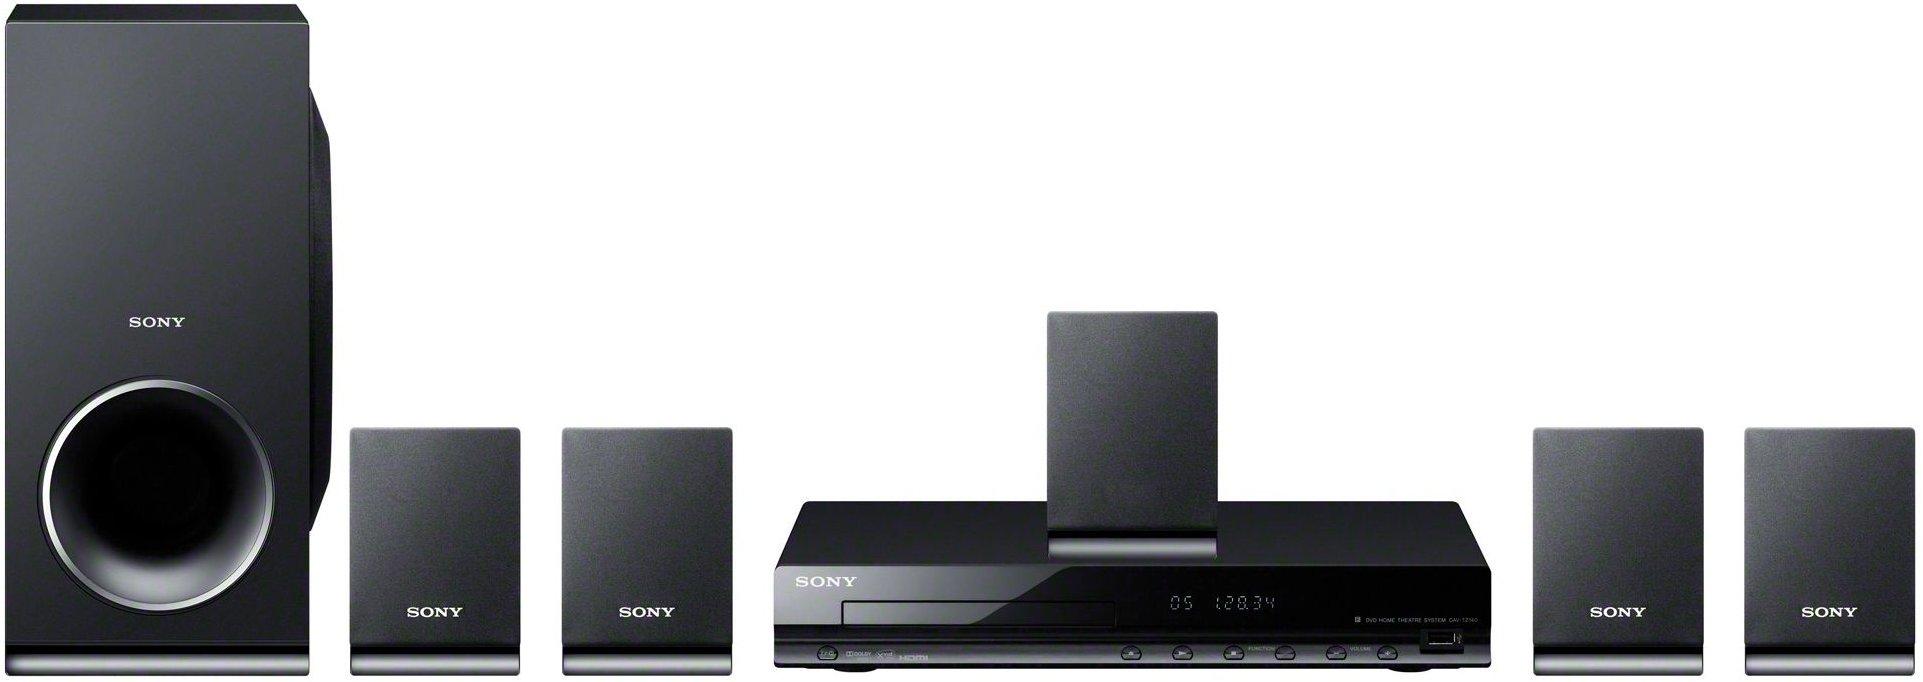 Sony DAV-TZ140 - домашний кинотеатр (Black)